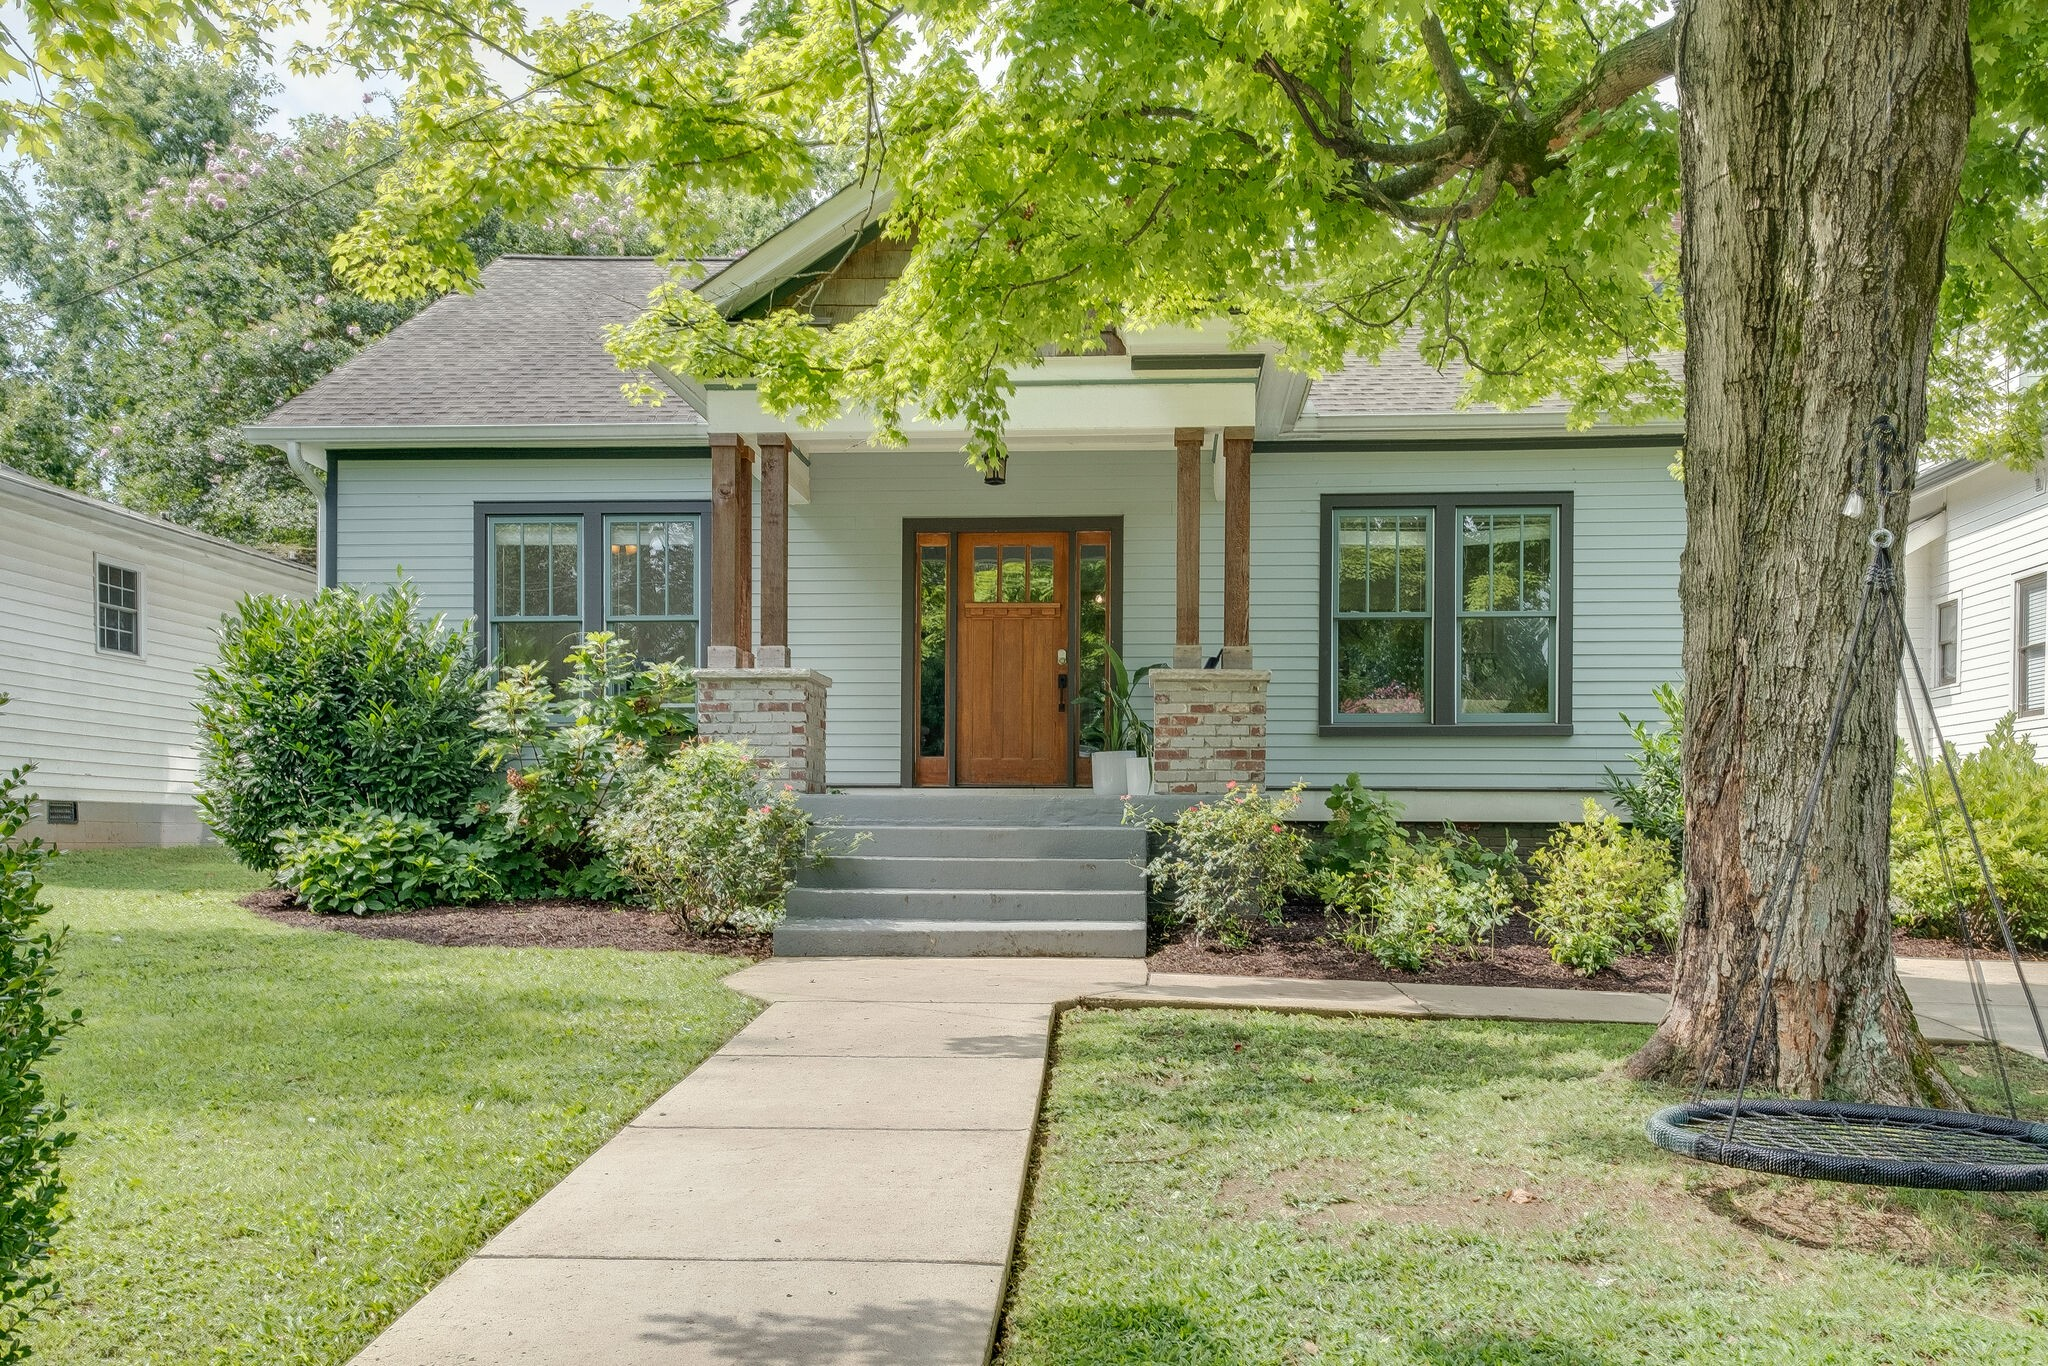 1130 McChesney Ave Property Photo - Nashville, TN real estate listing